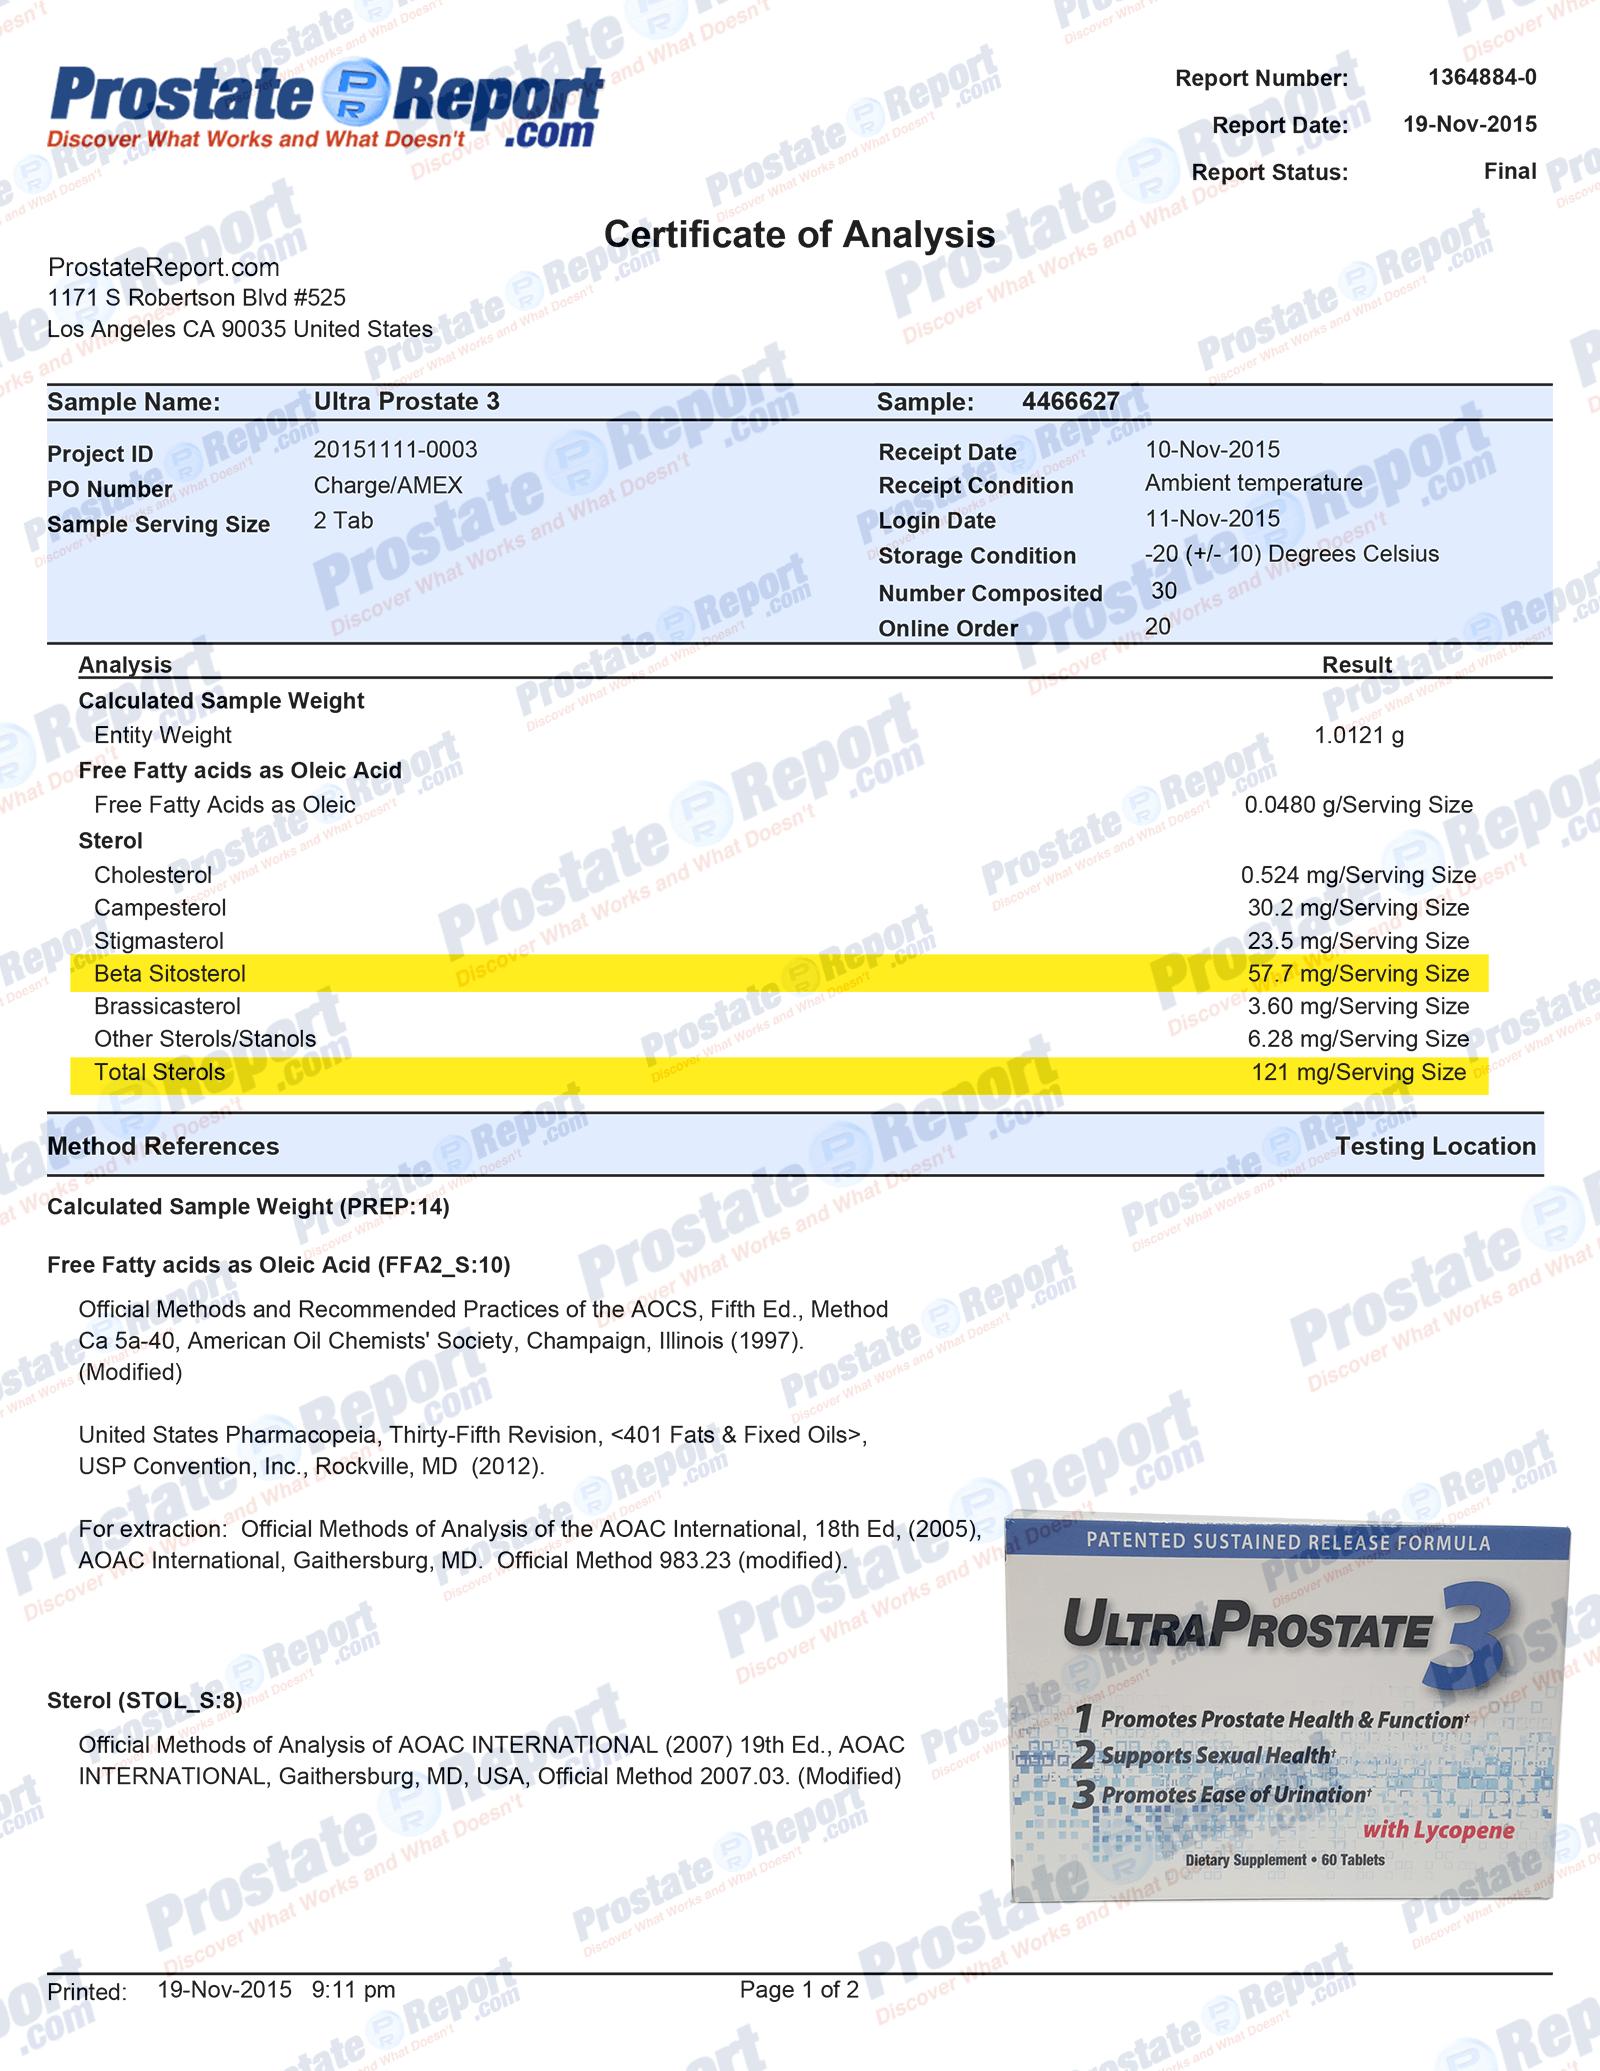 Prostalex Plus lab report